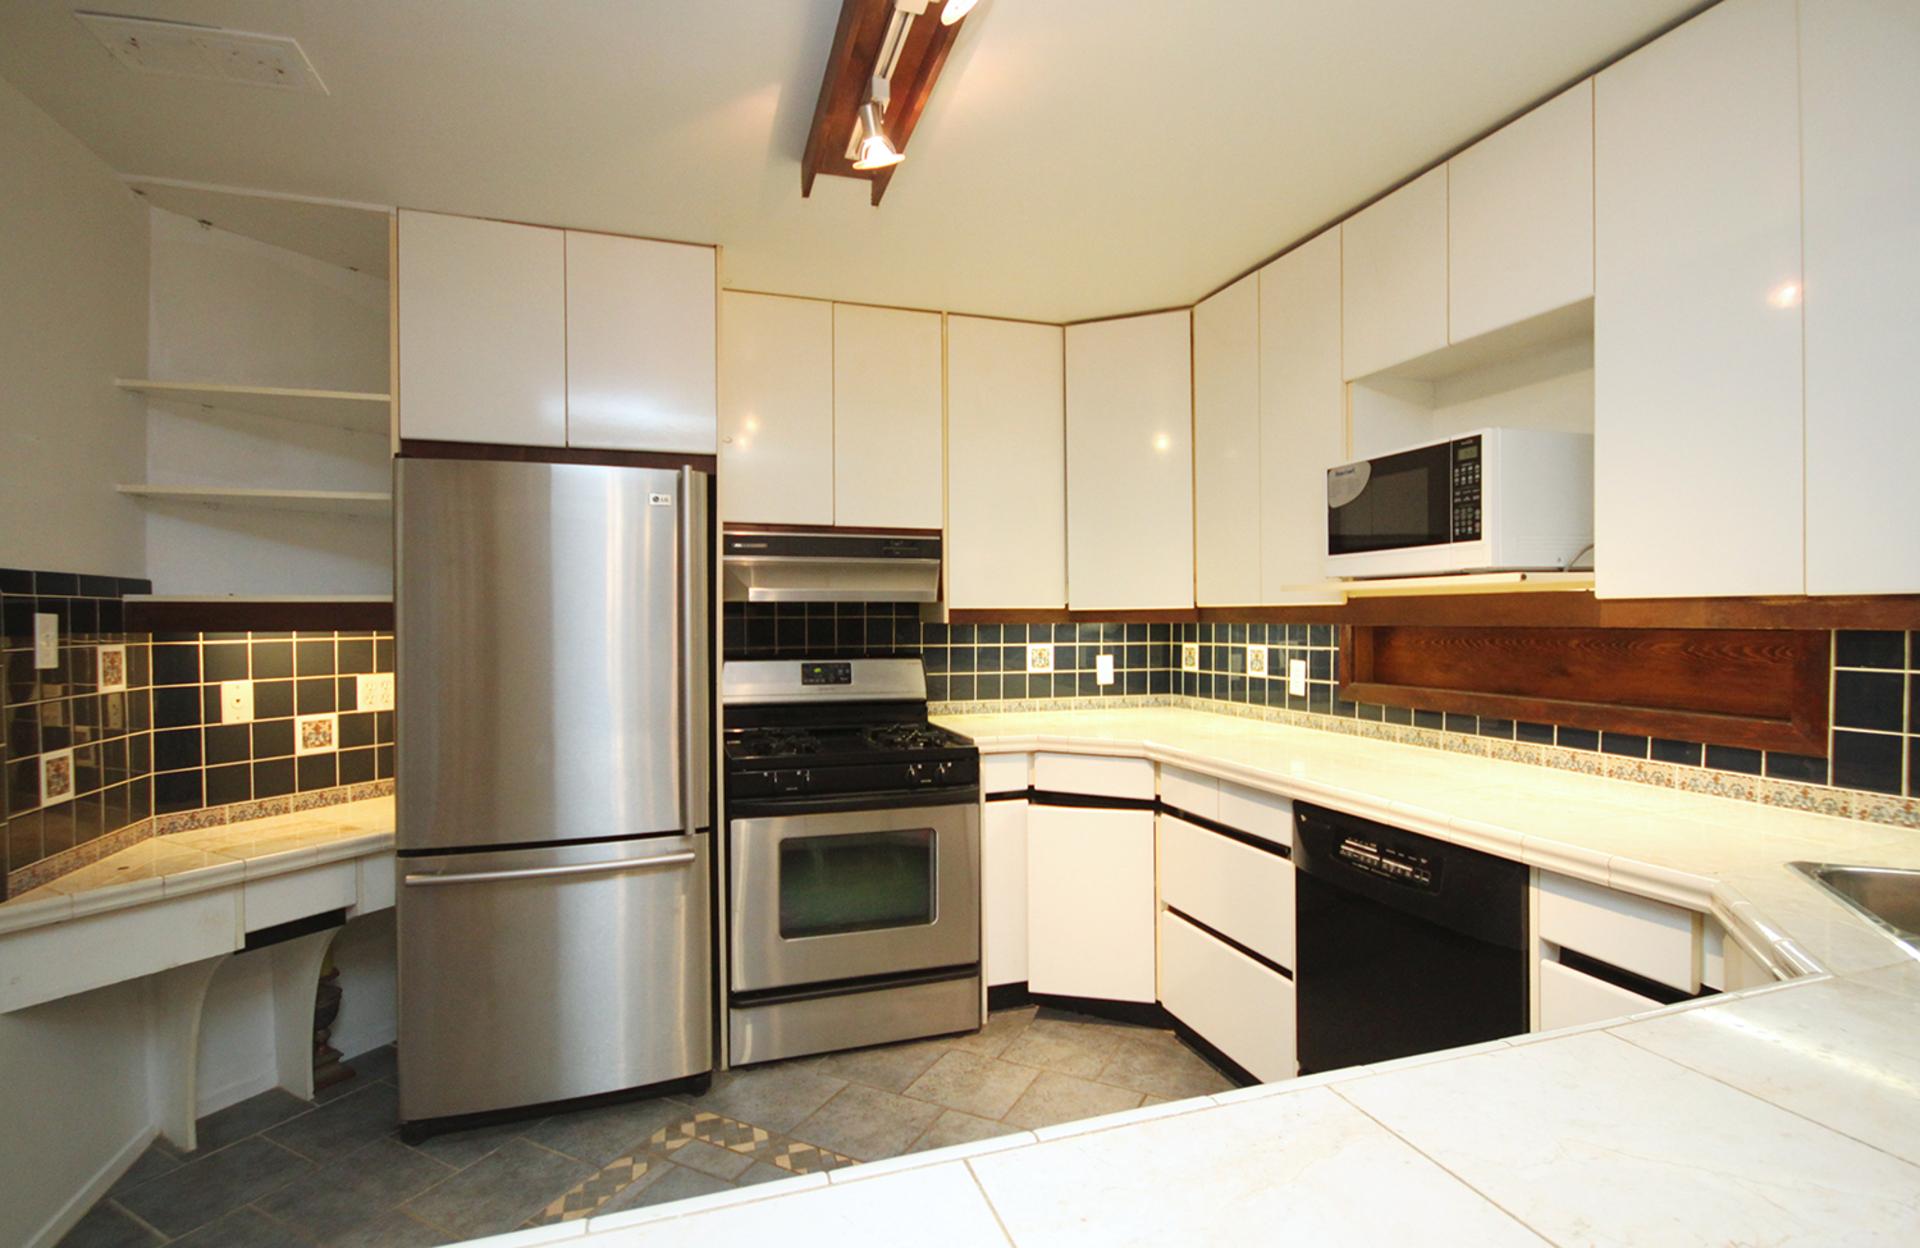 Kitchen at 9 Waxwing Place, Banbury-Don Mills, Toronto